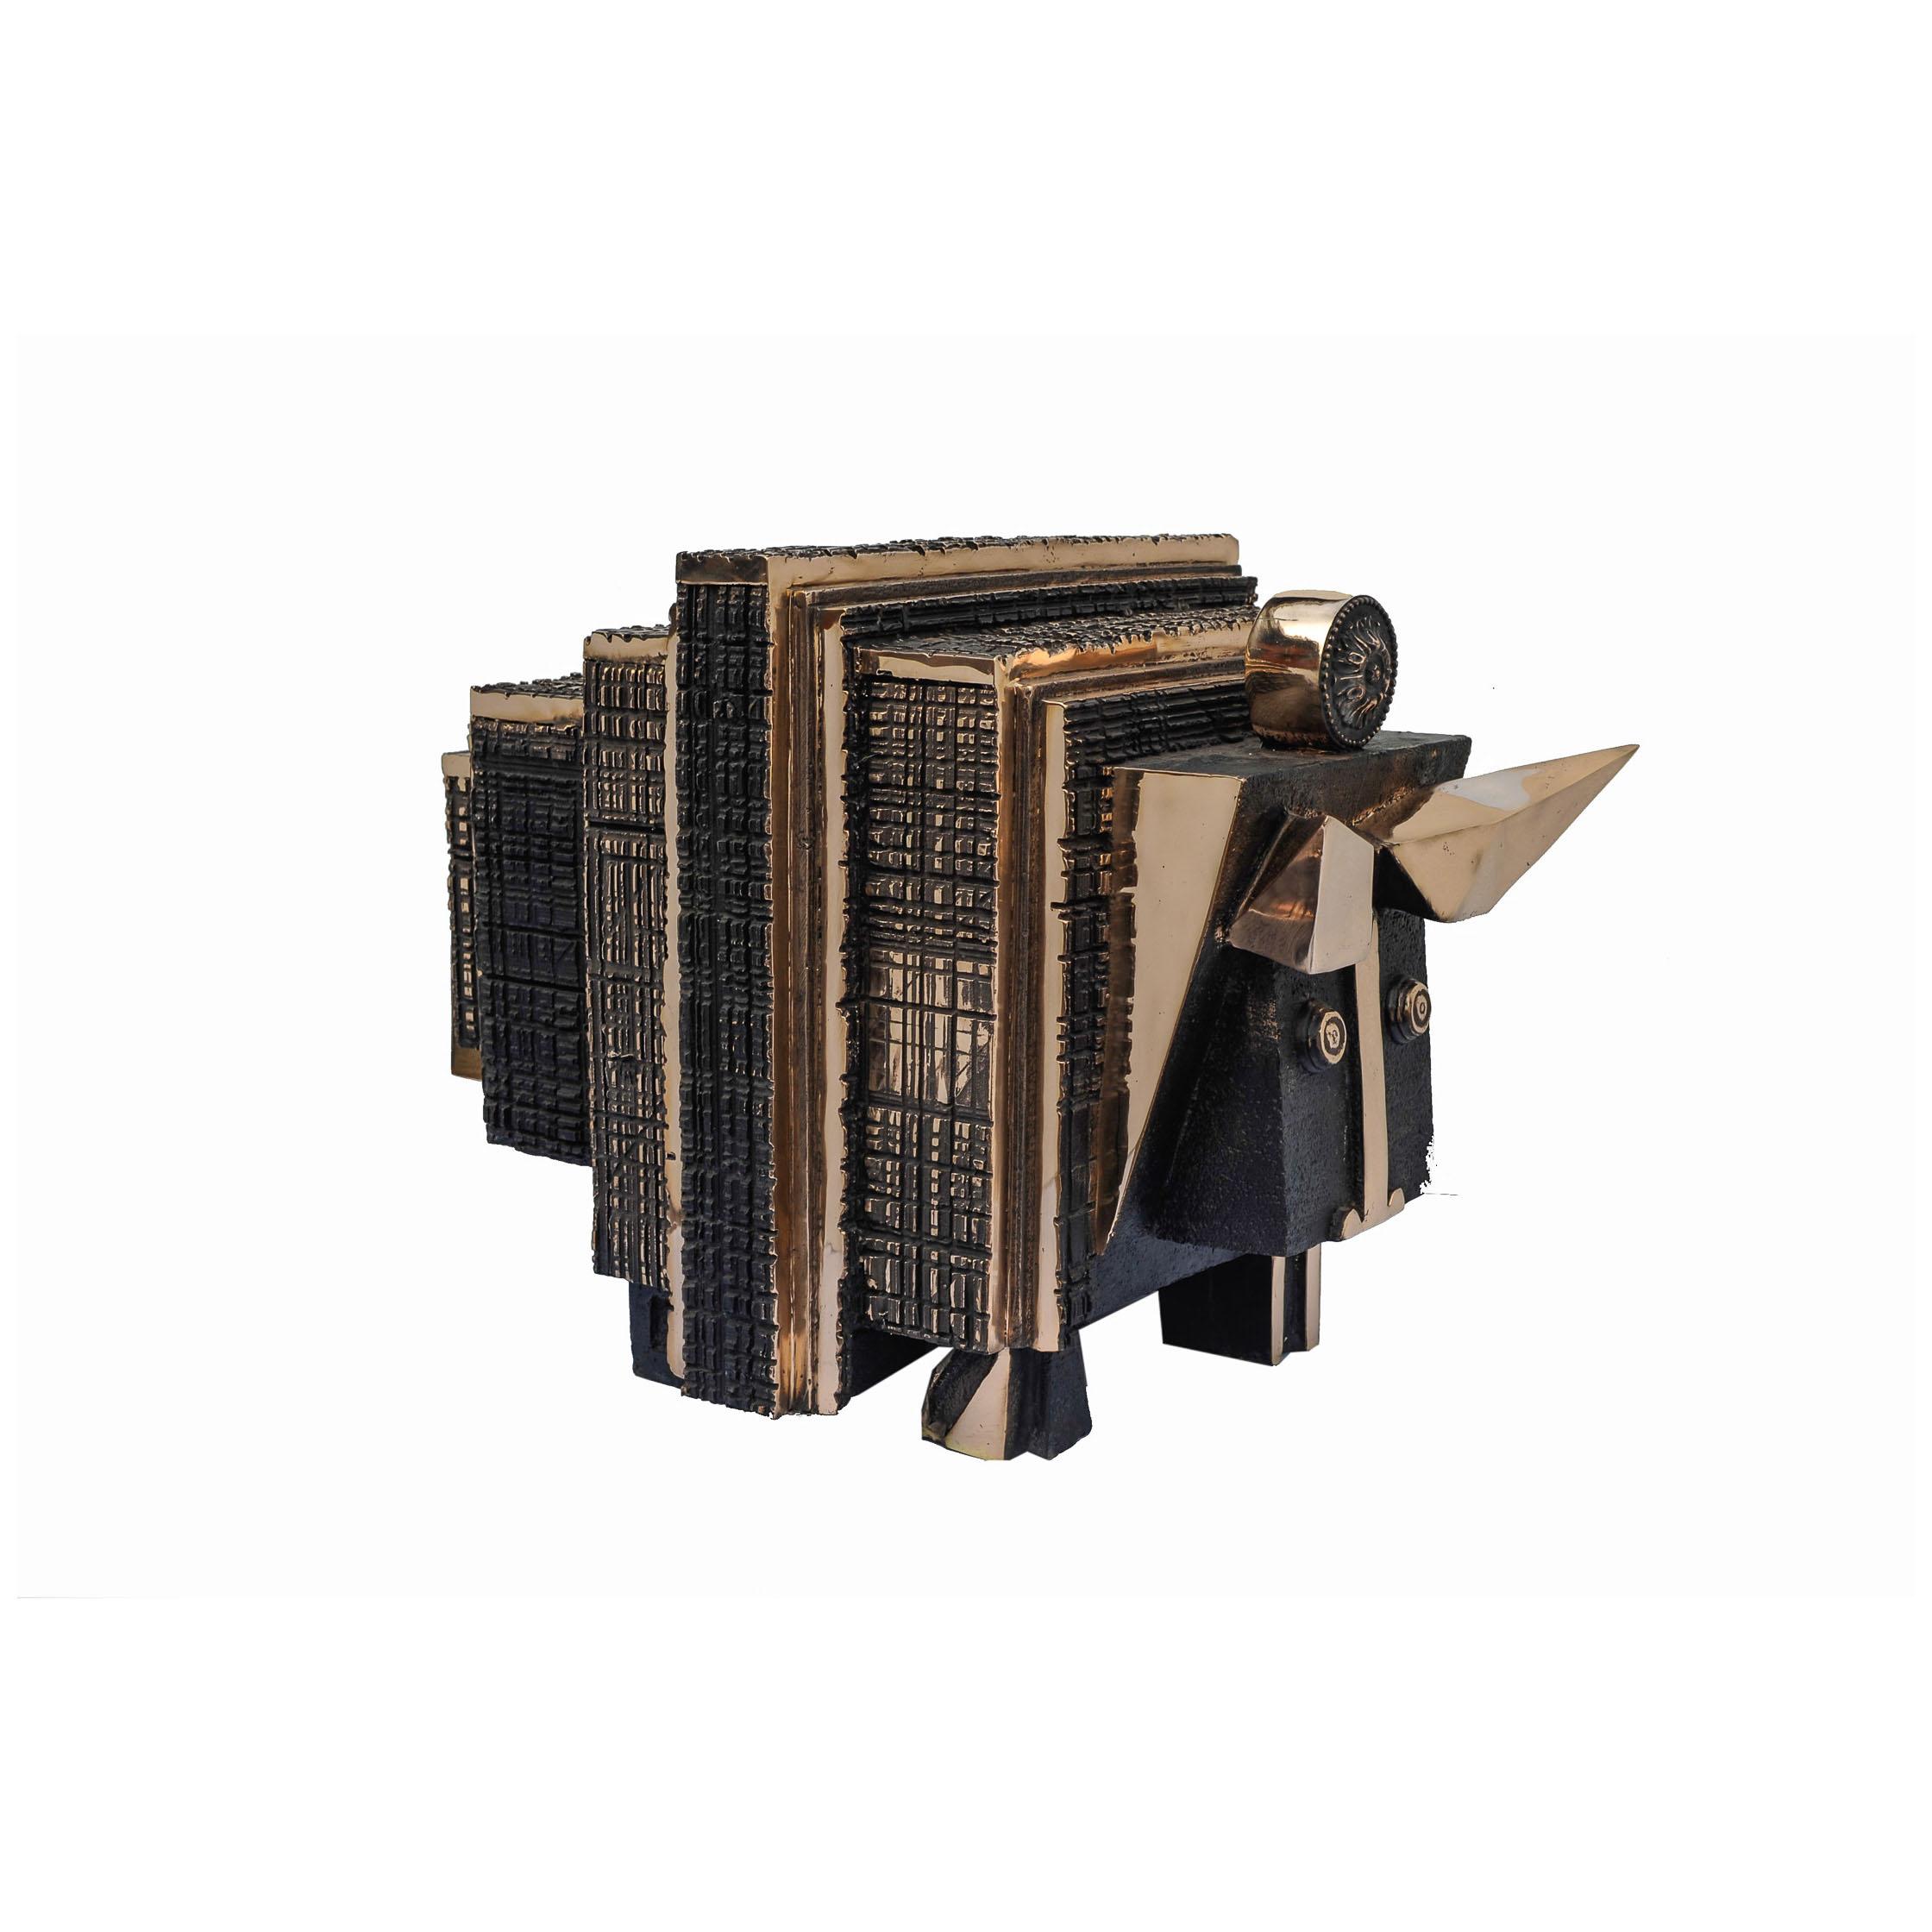 Potenza's Ark • Gianmaria Potenza